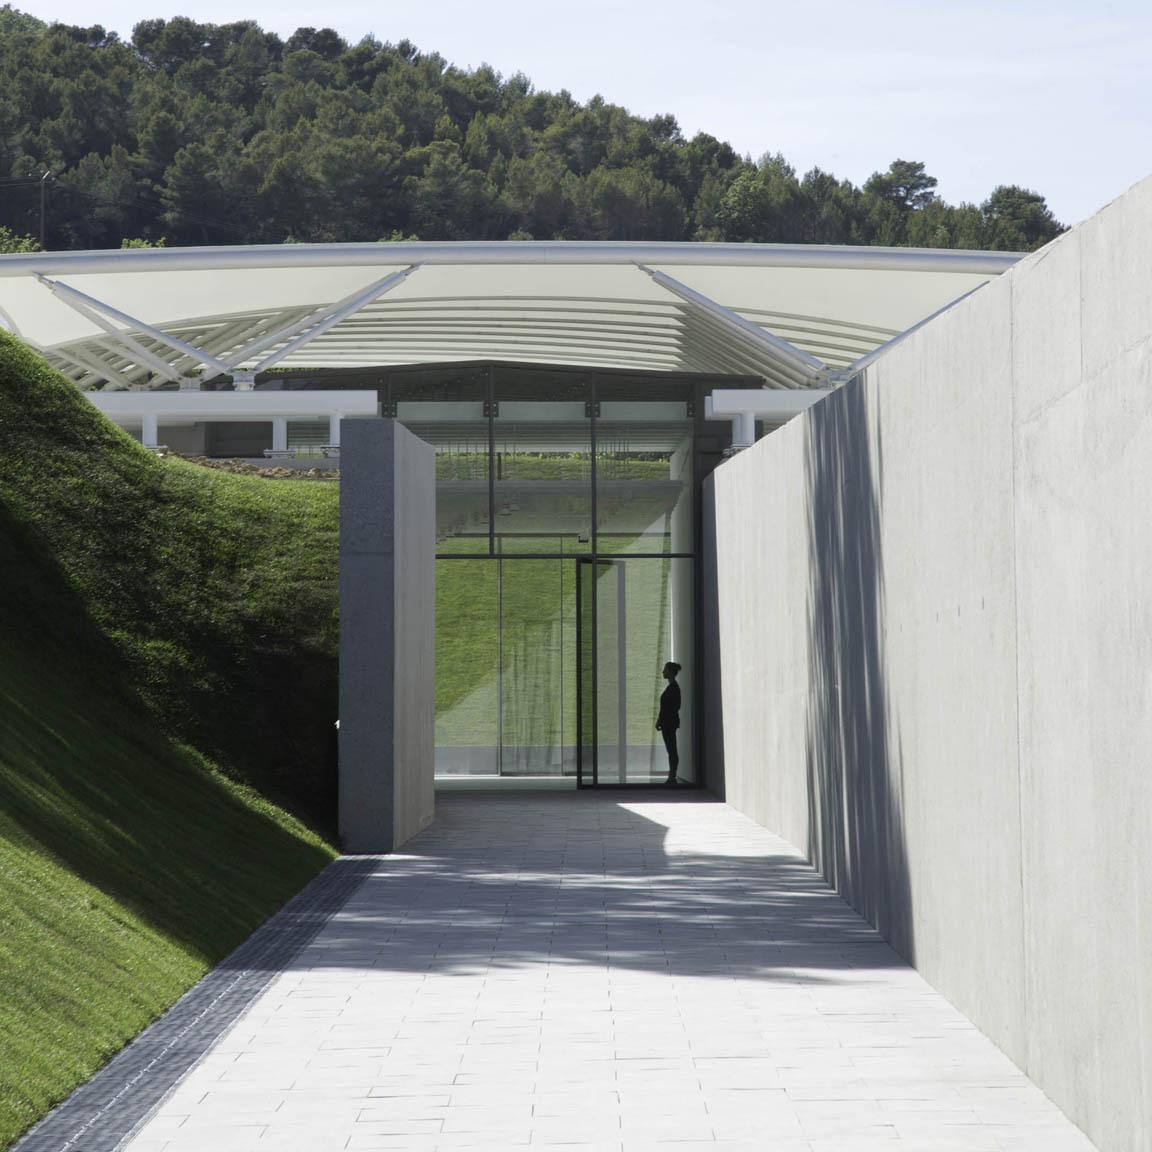 Gallery: Château La Coste Art Gallery / Renzo Piano Building